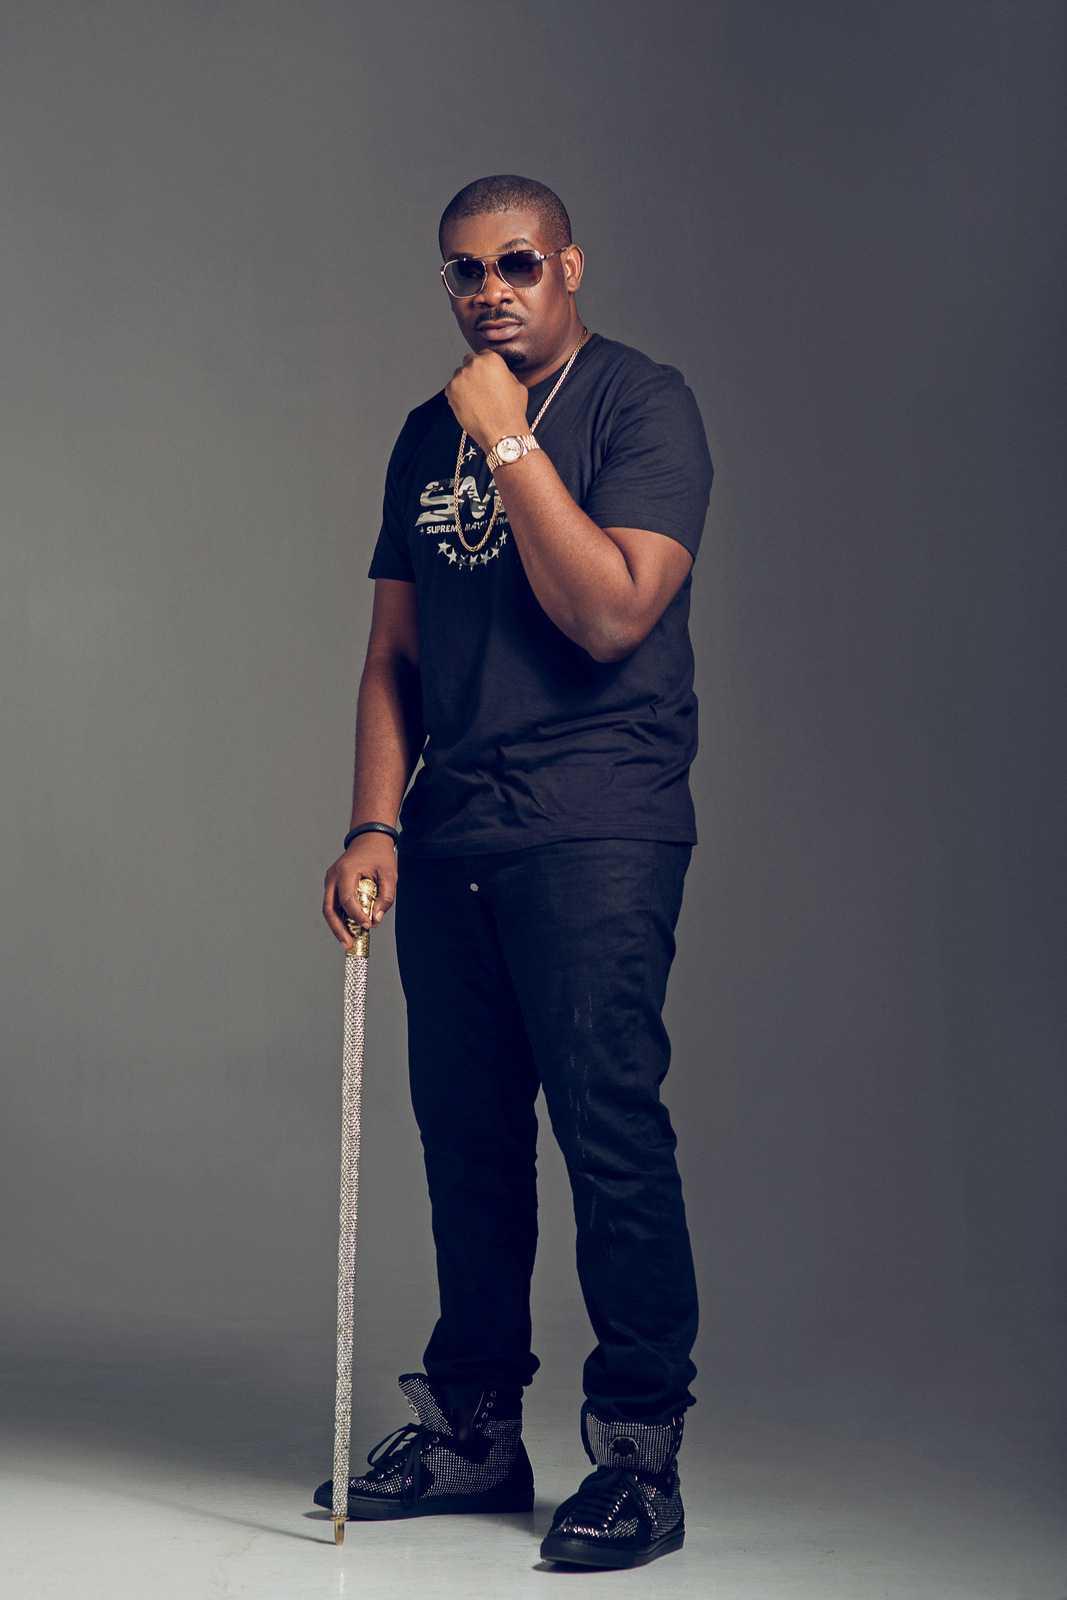 Scooper - Fashion News: TOP 6 HIGHEST EARNING NIGERIAN MUSICIANS